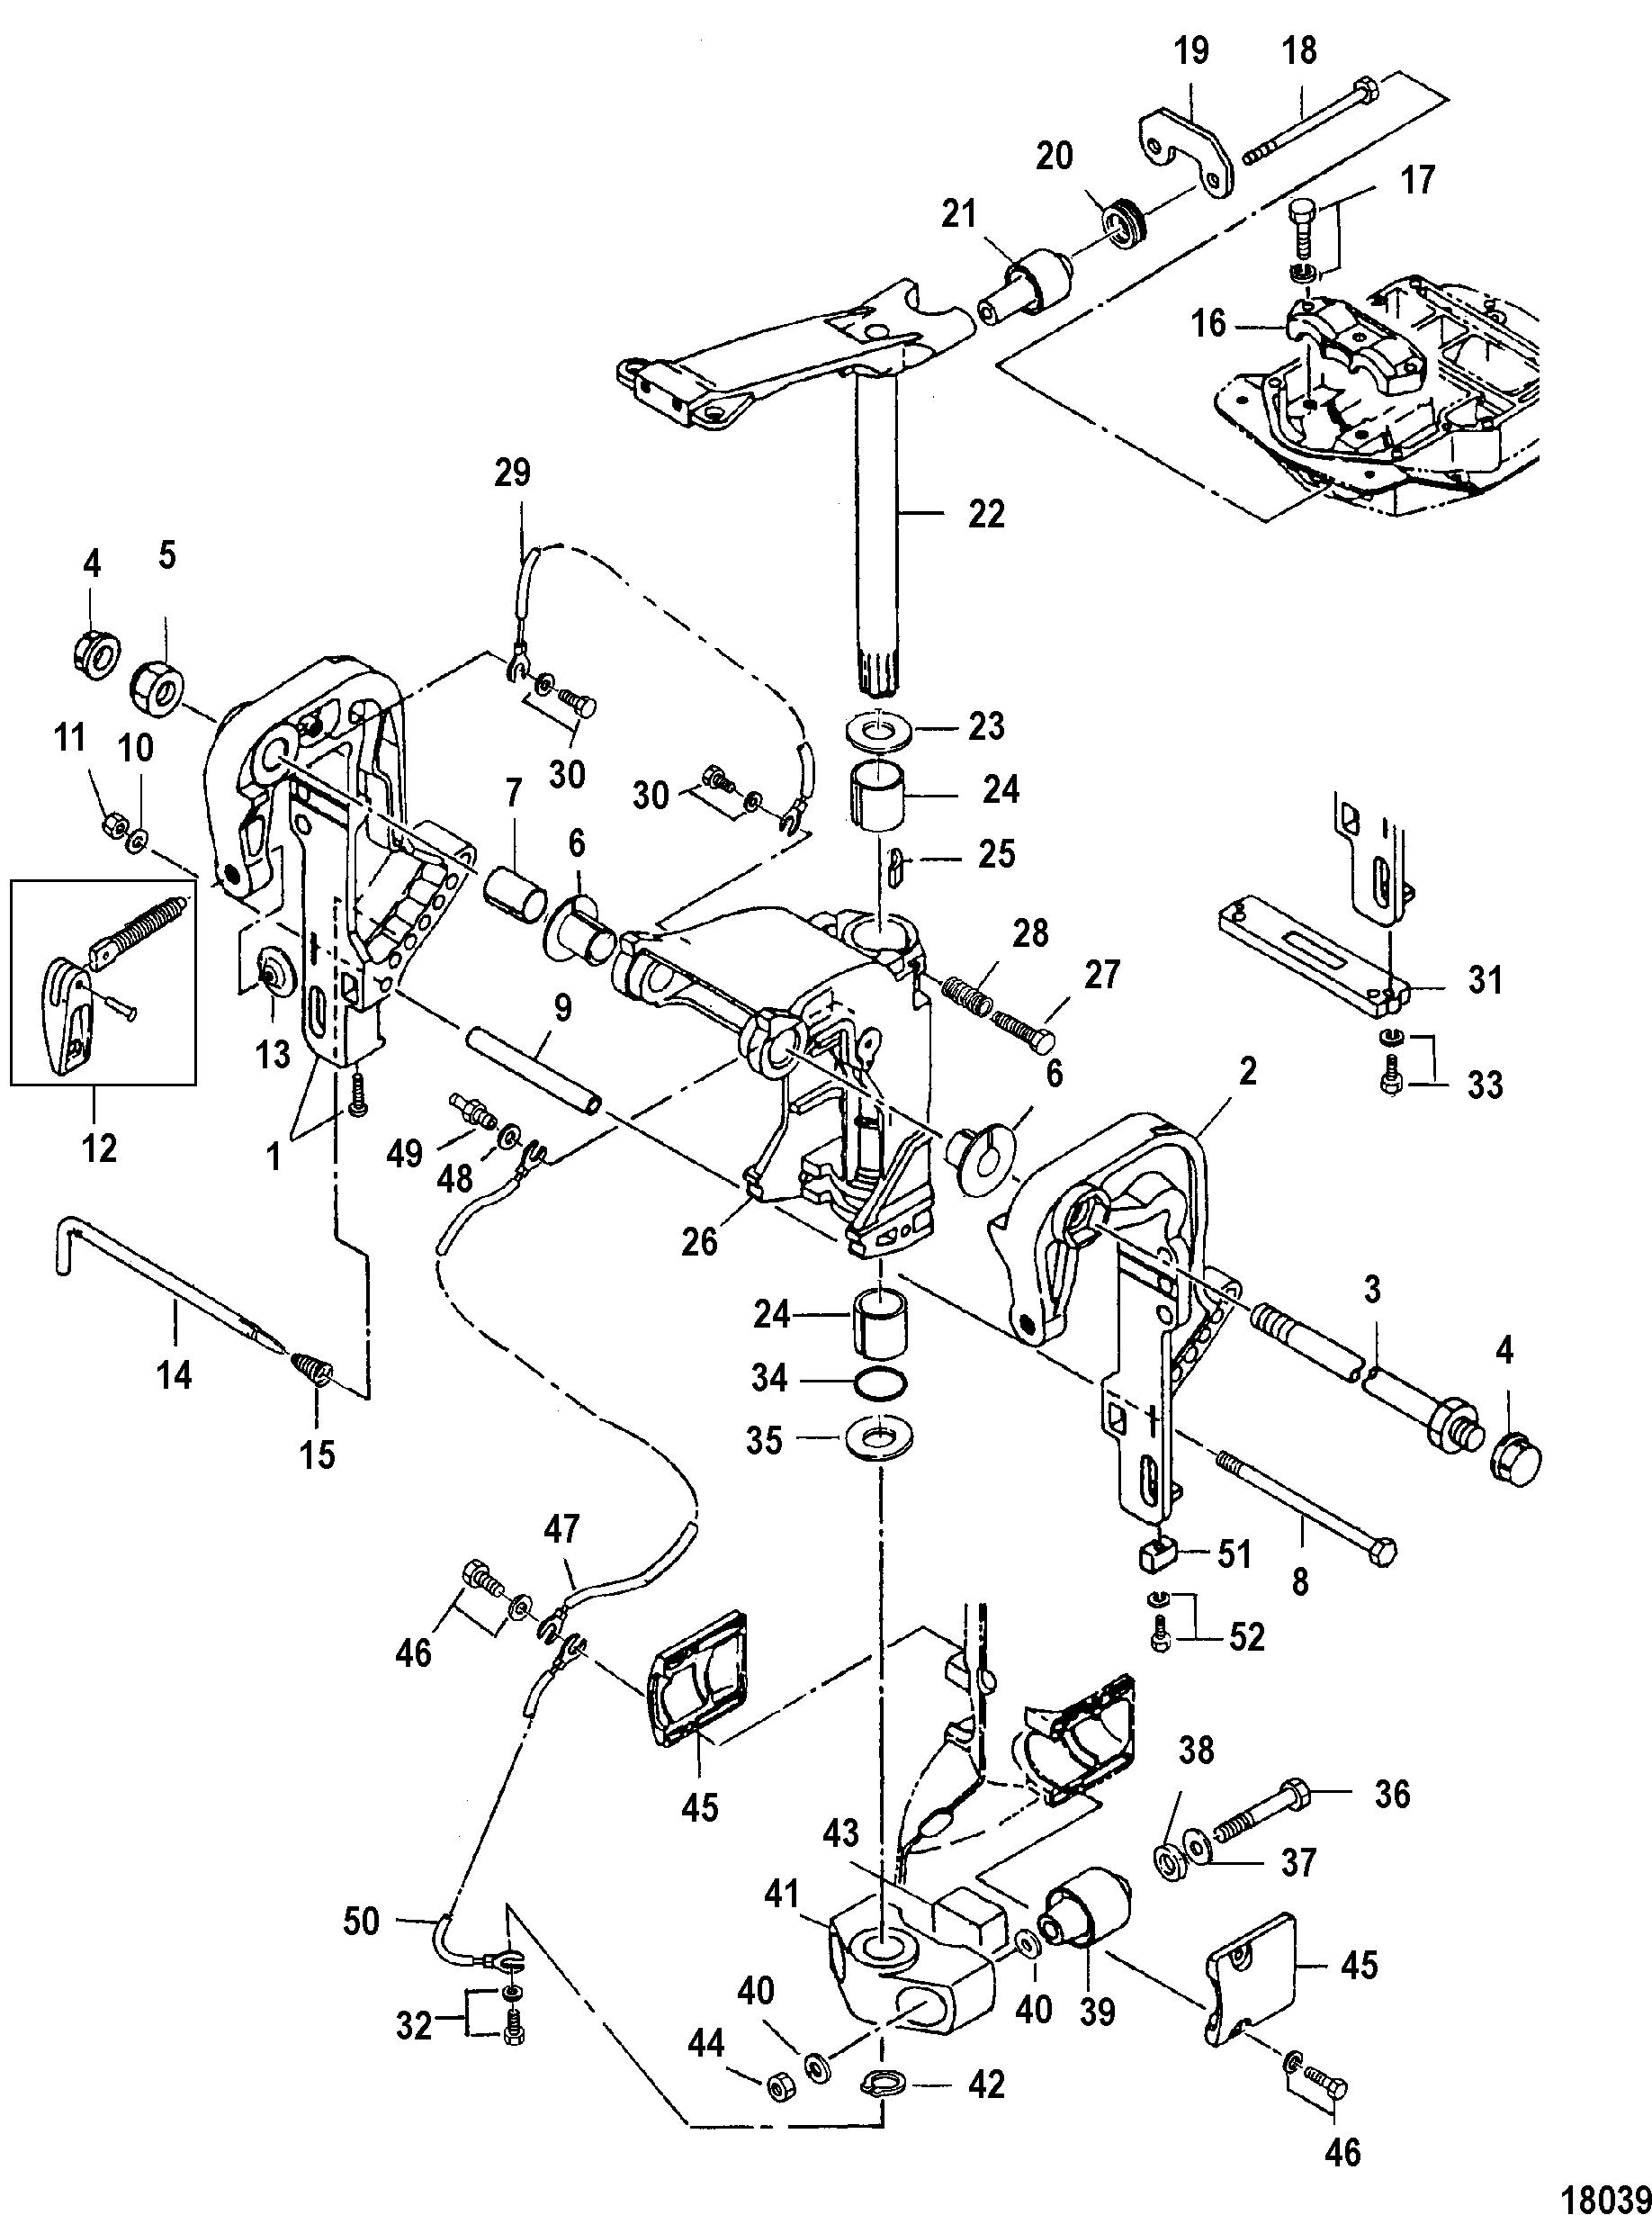 Diagrams Wiring International Dt466e Diagram